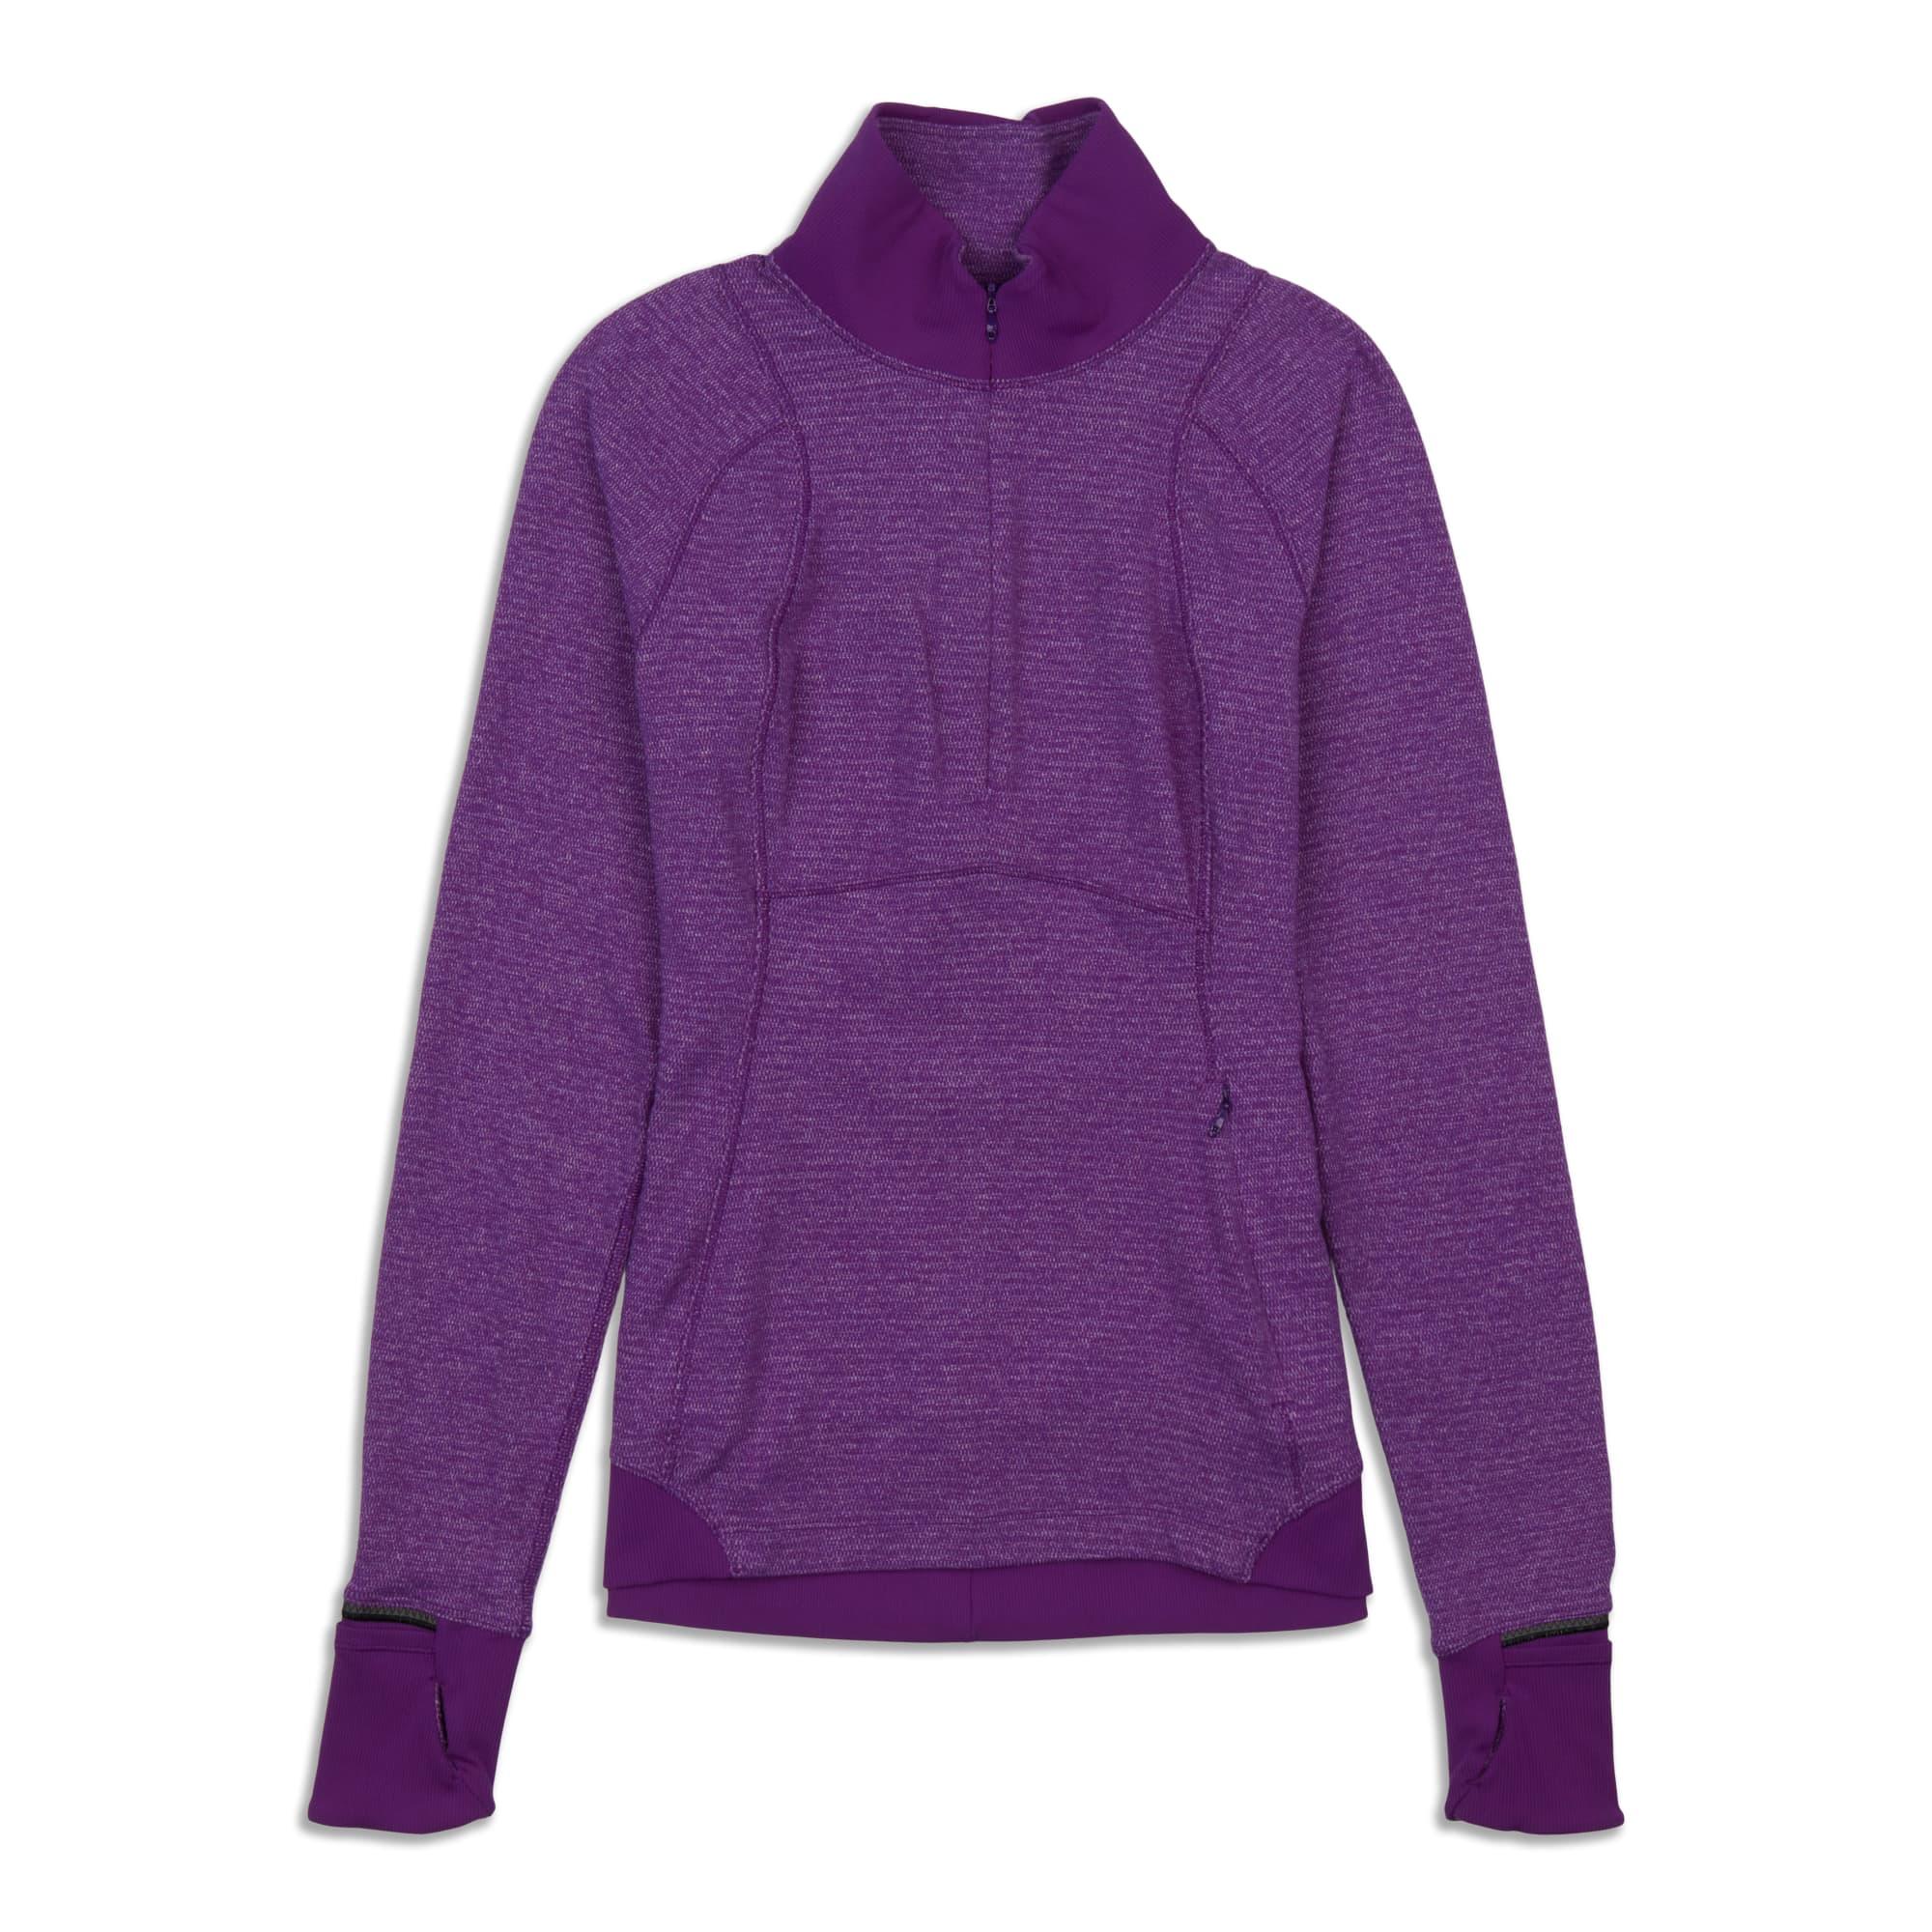 Main product image: Runderful Half Zip Long Sleeve Shirt - Resale